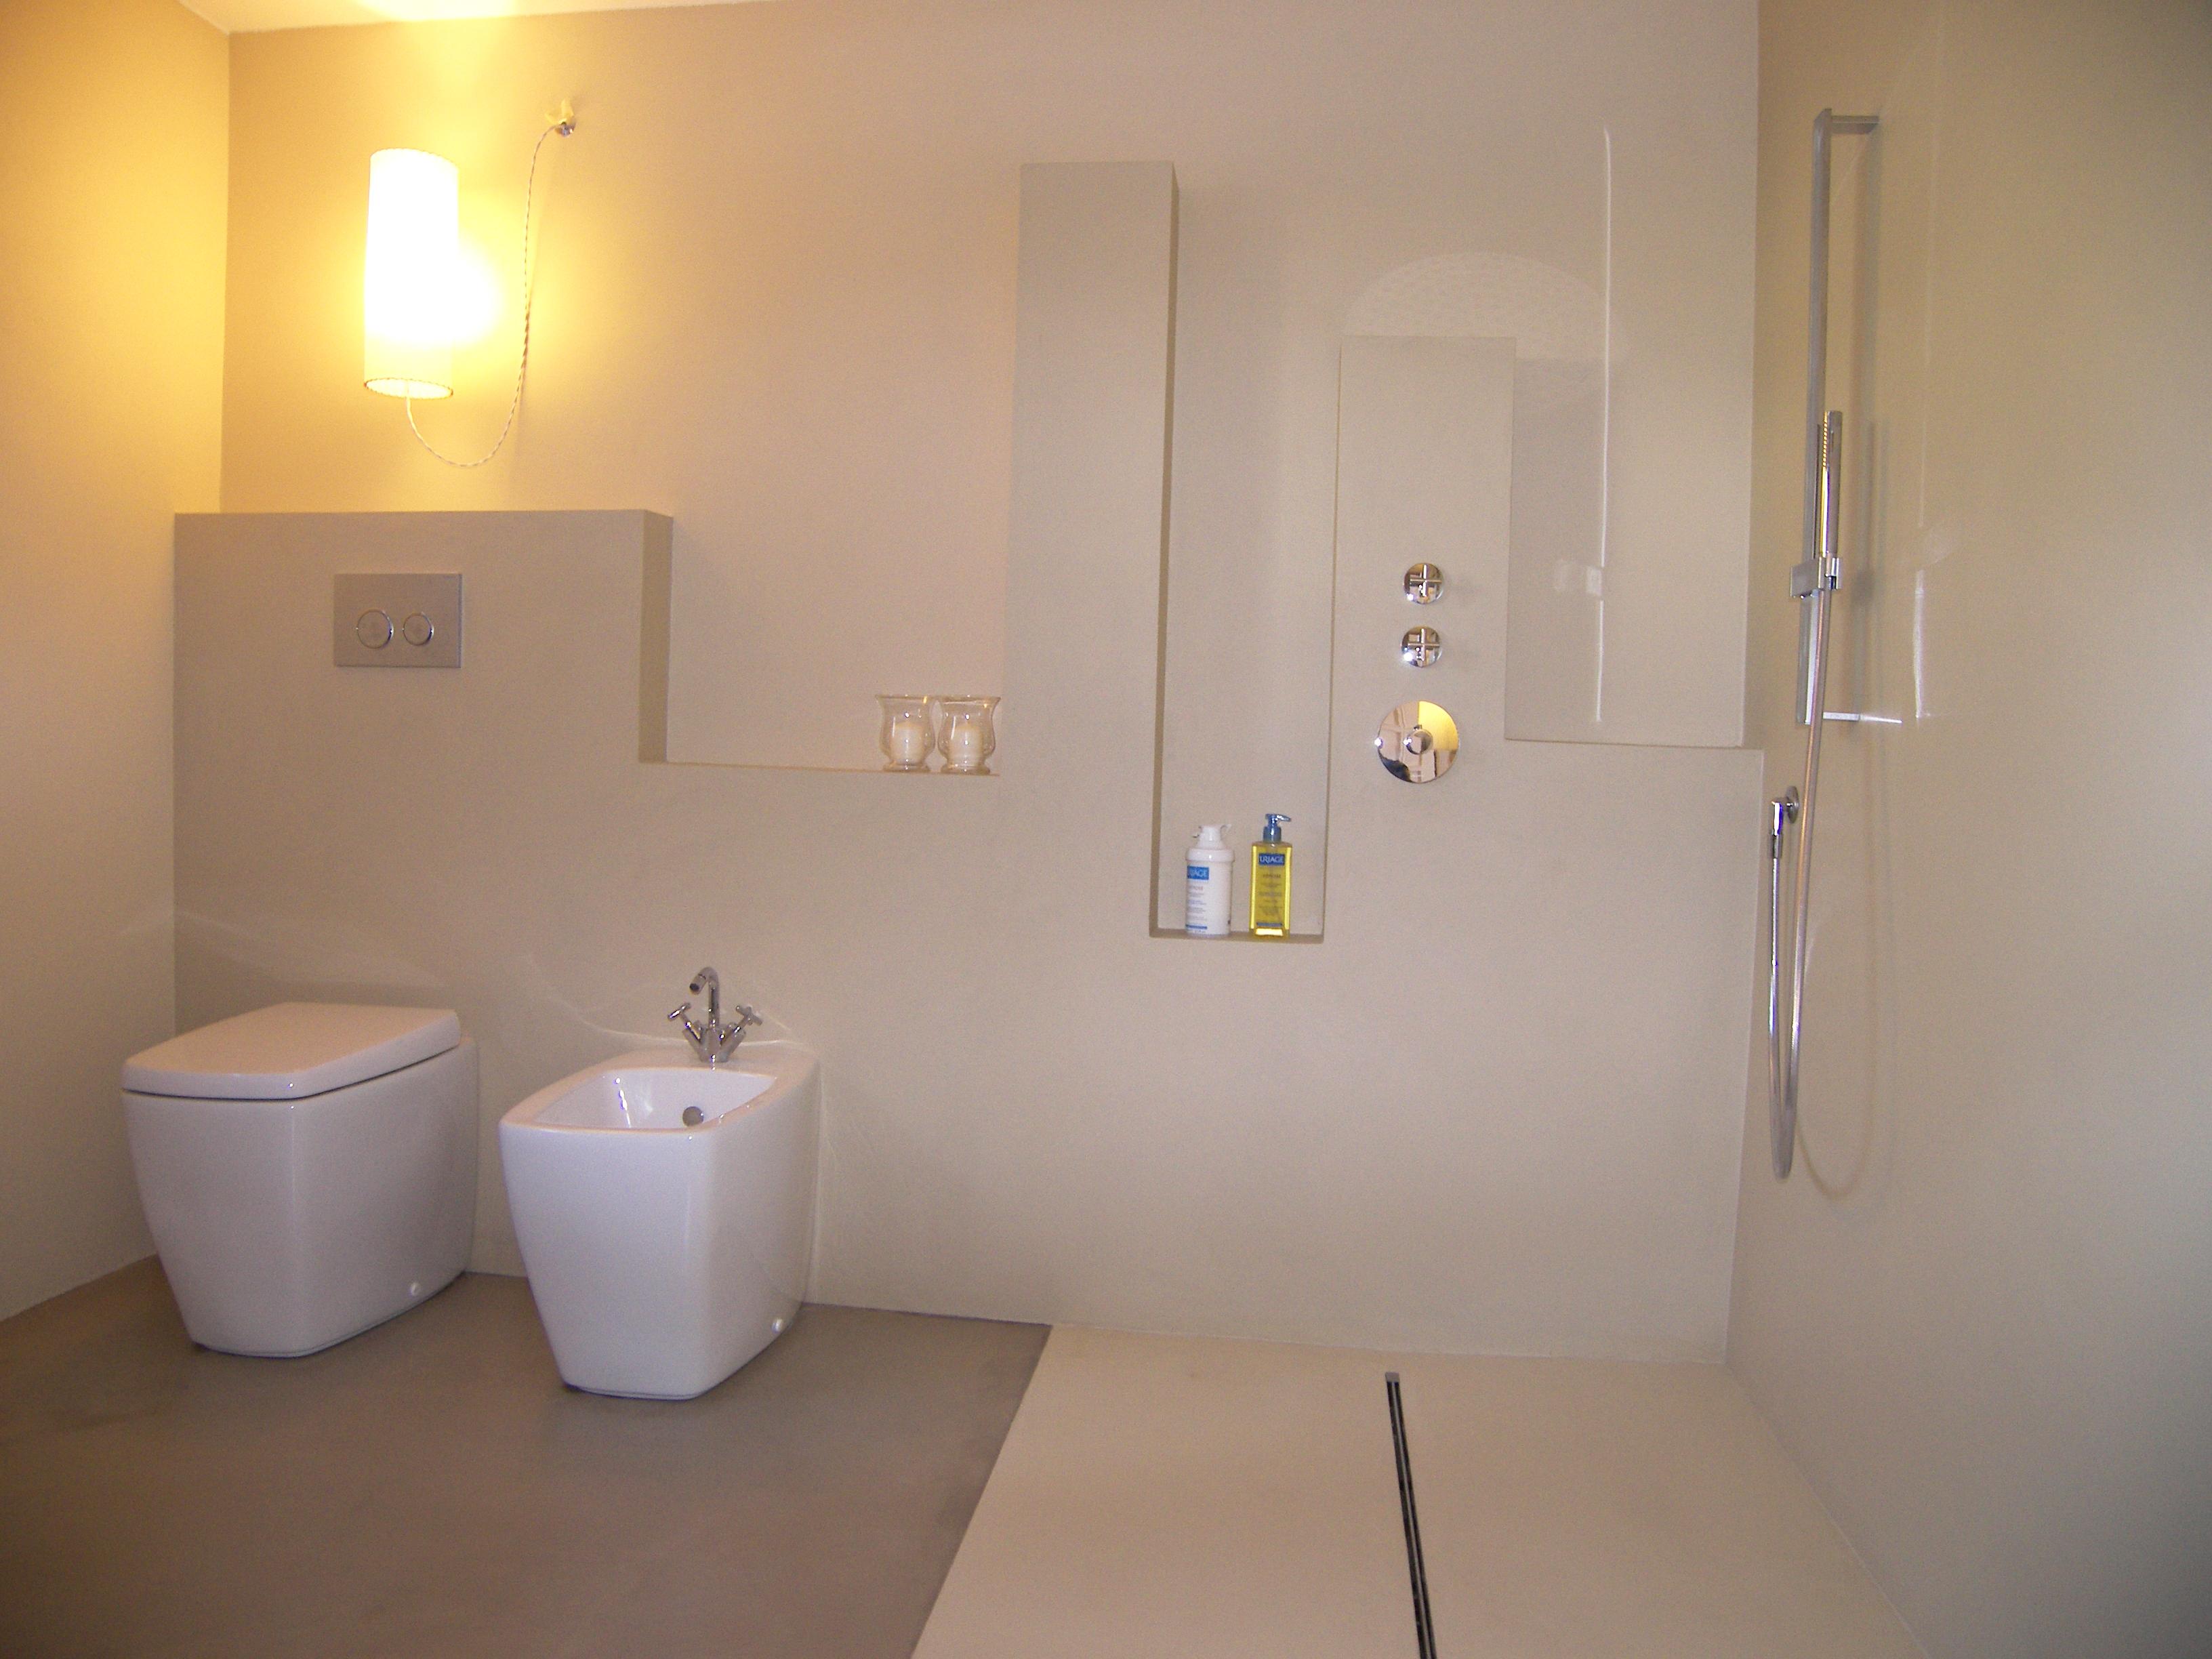 Excellent interior design bagno with resina in bagno - Pavimenti bagno in resina ...